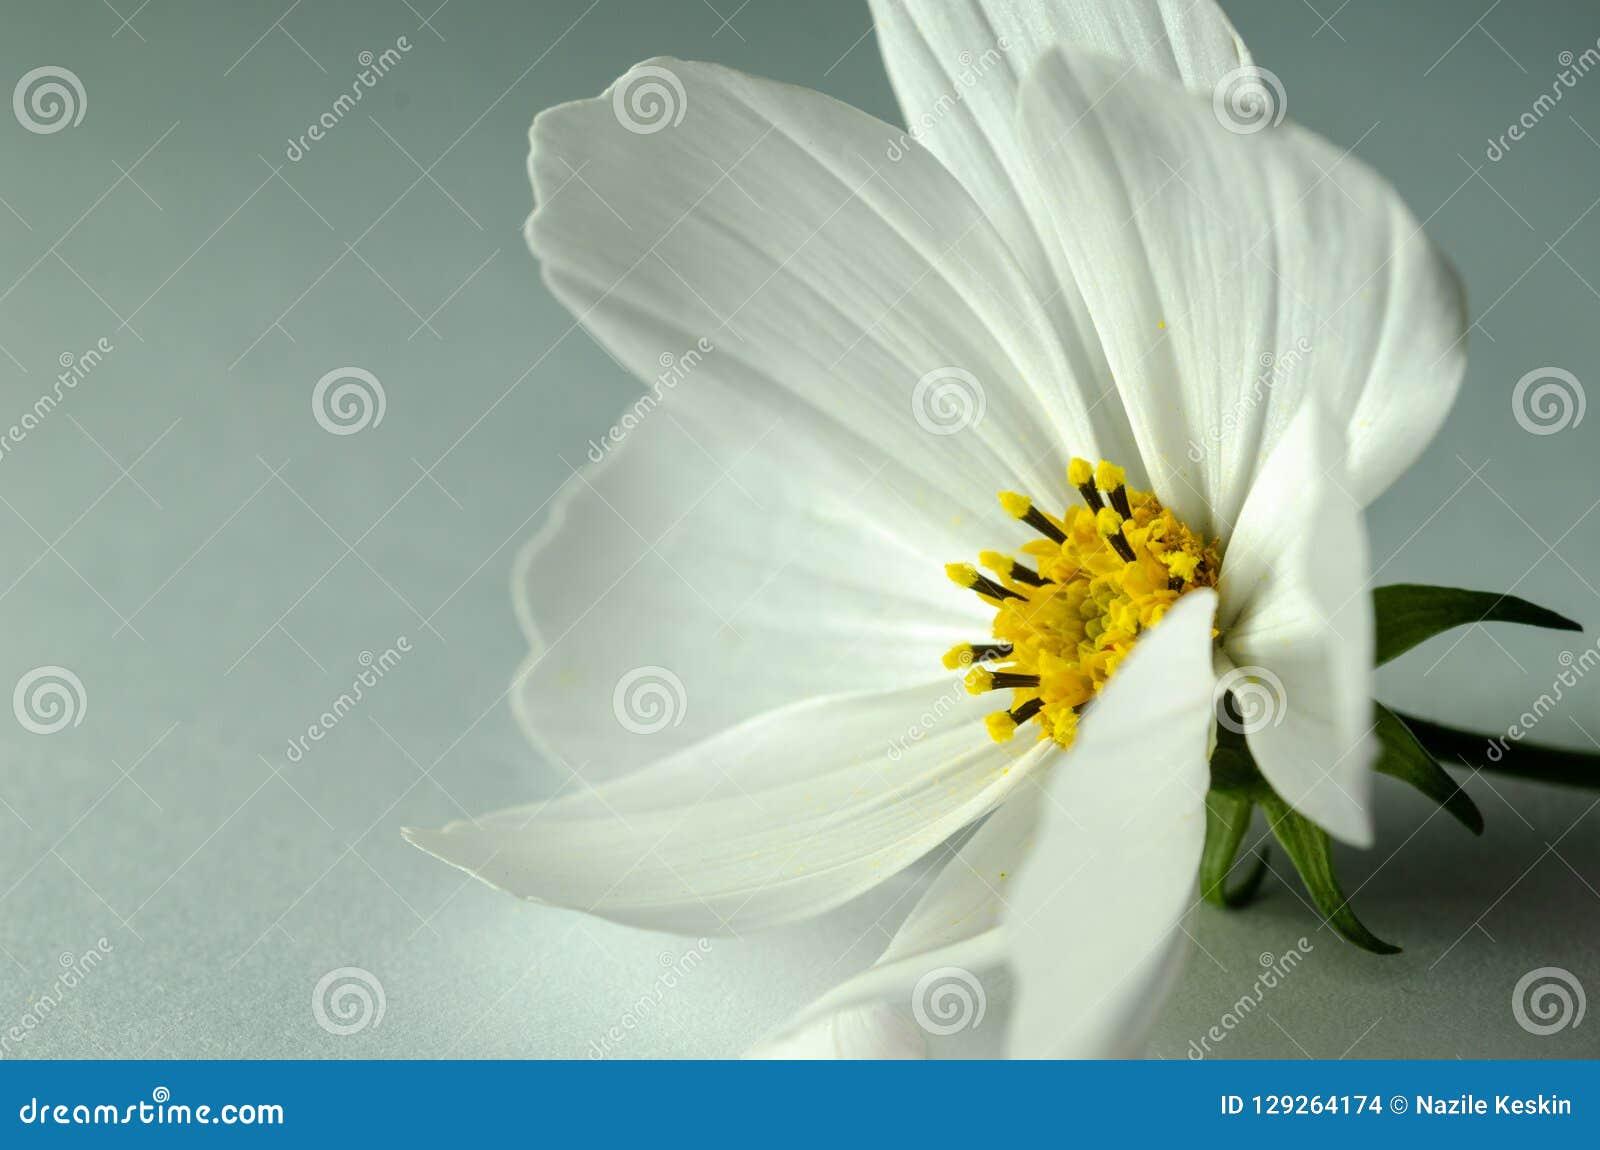 Close Up White Cosmos Flower On The Aqua Background Stock Photo